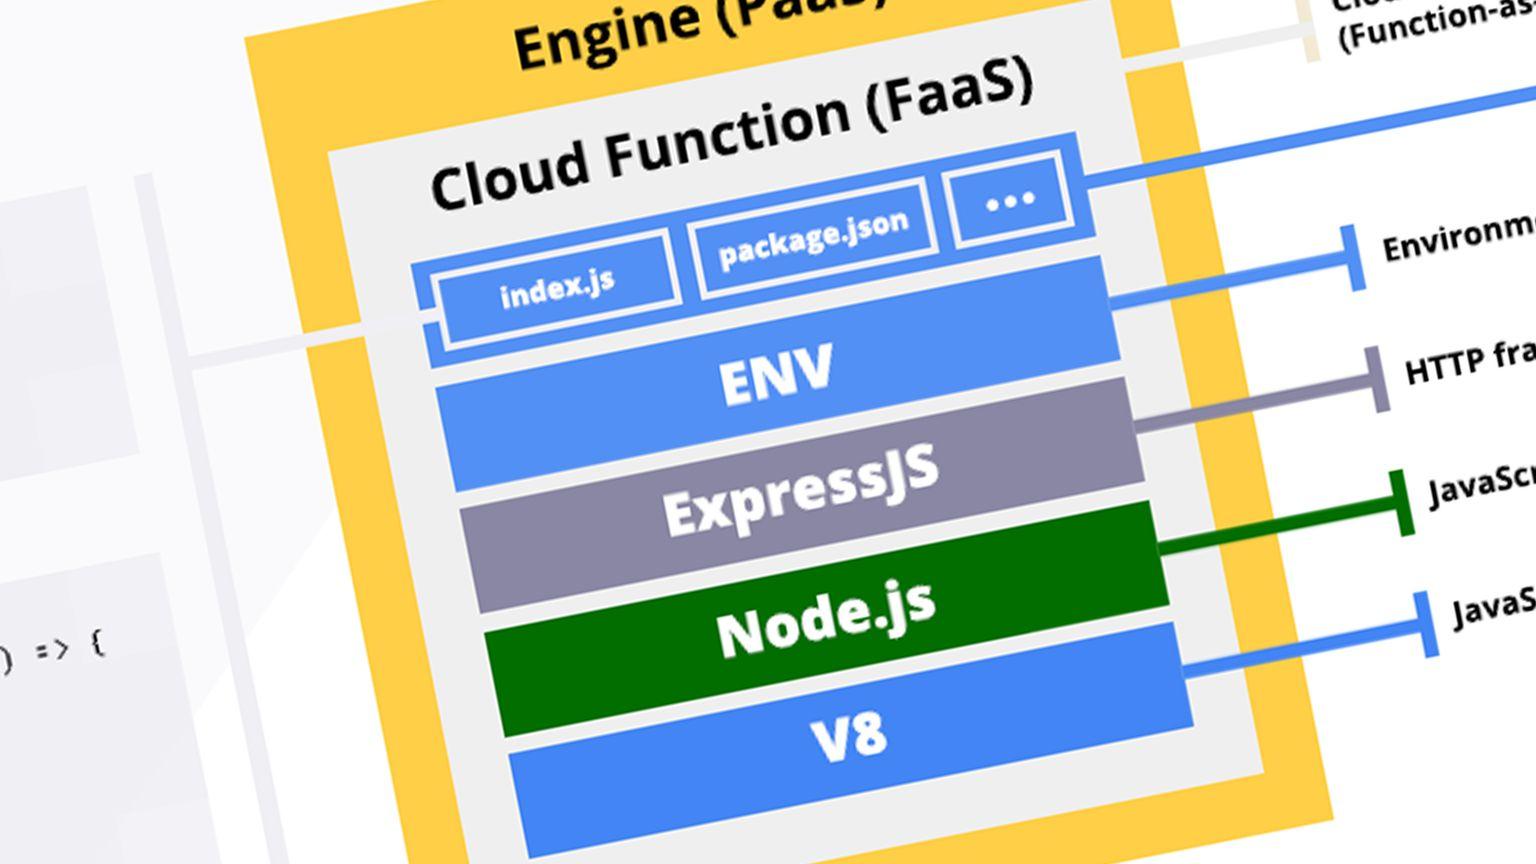 Cover Image for Anatomie d'une fonction Google Cloud [Infographie]